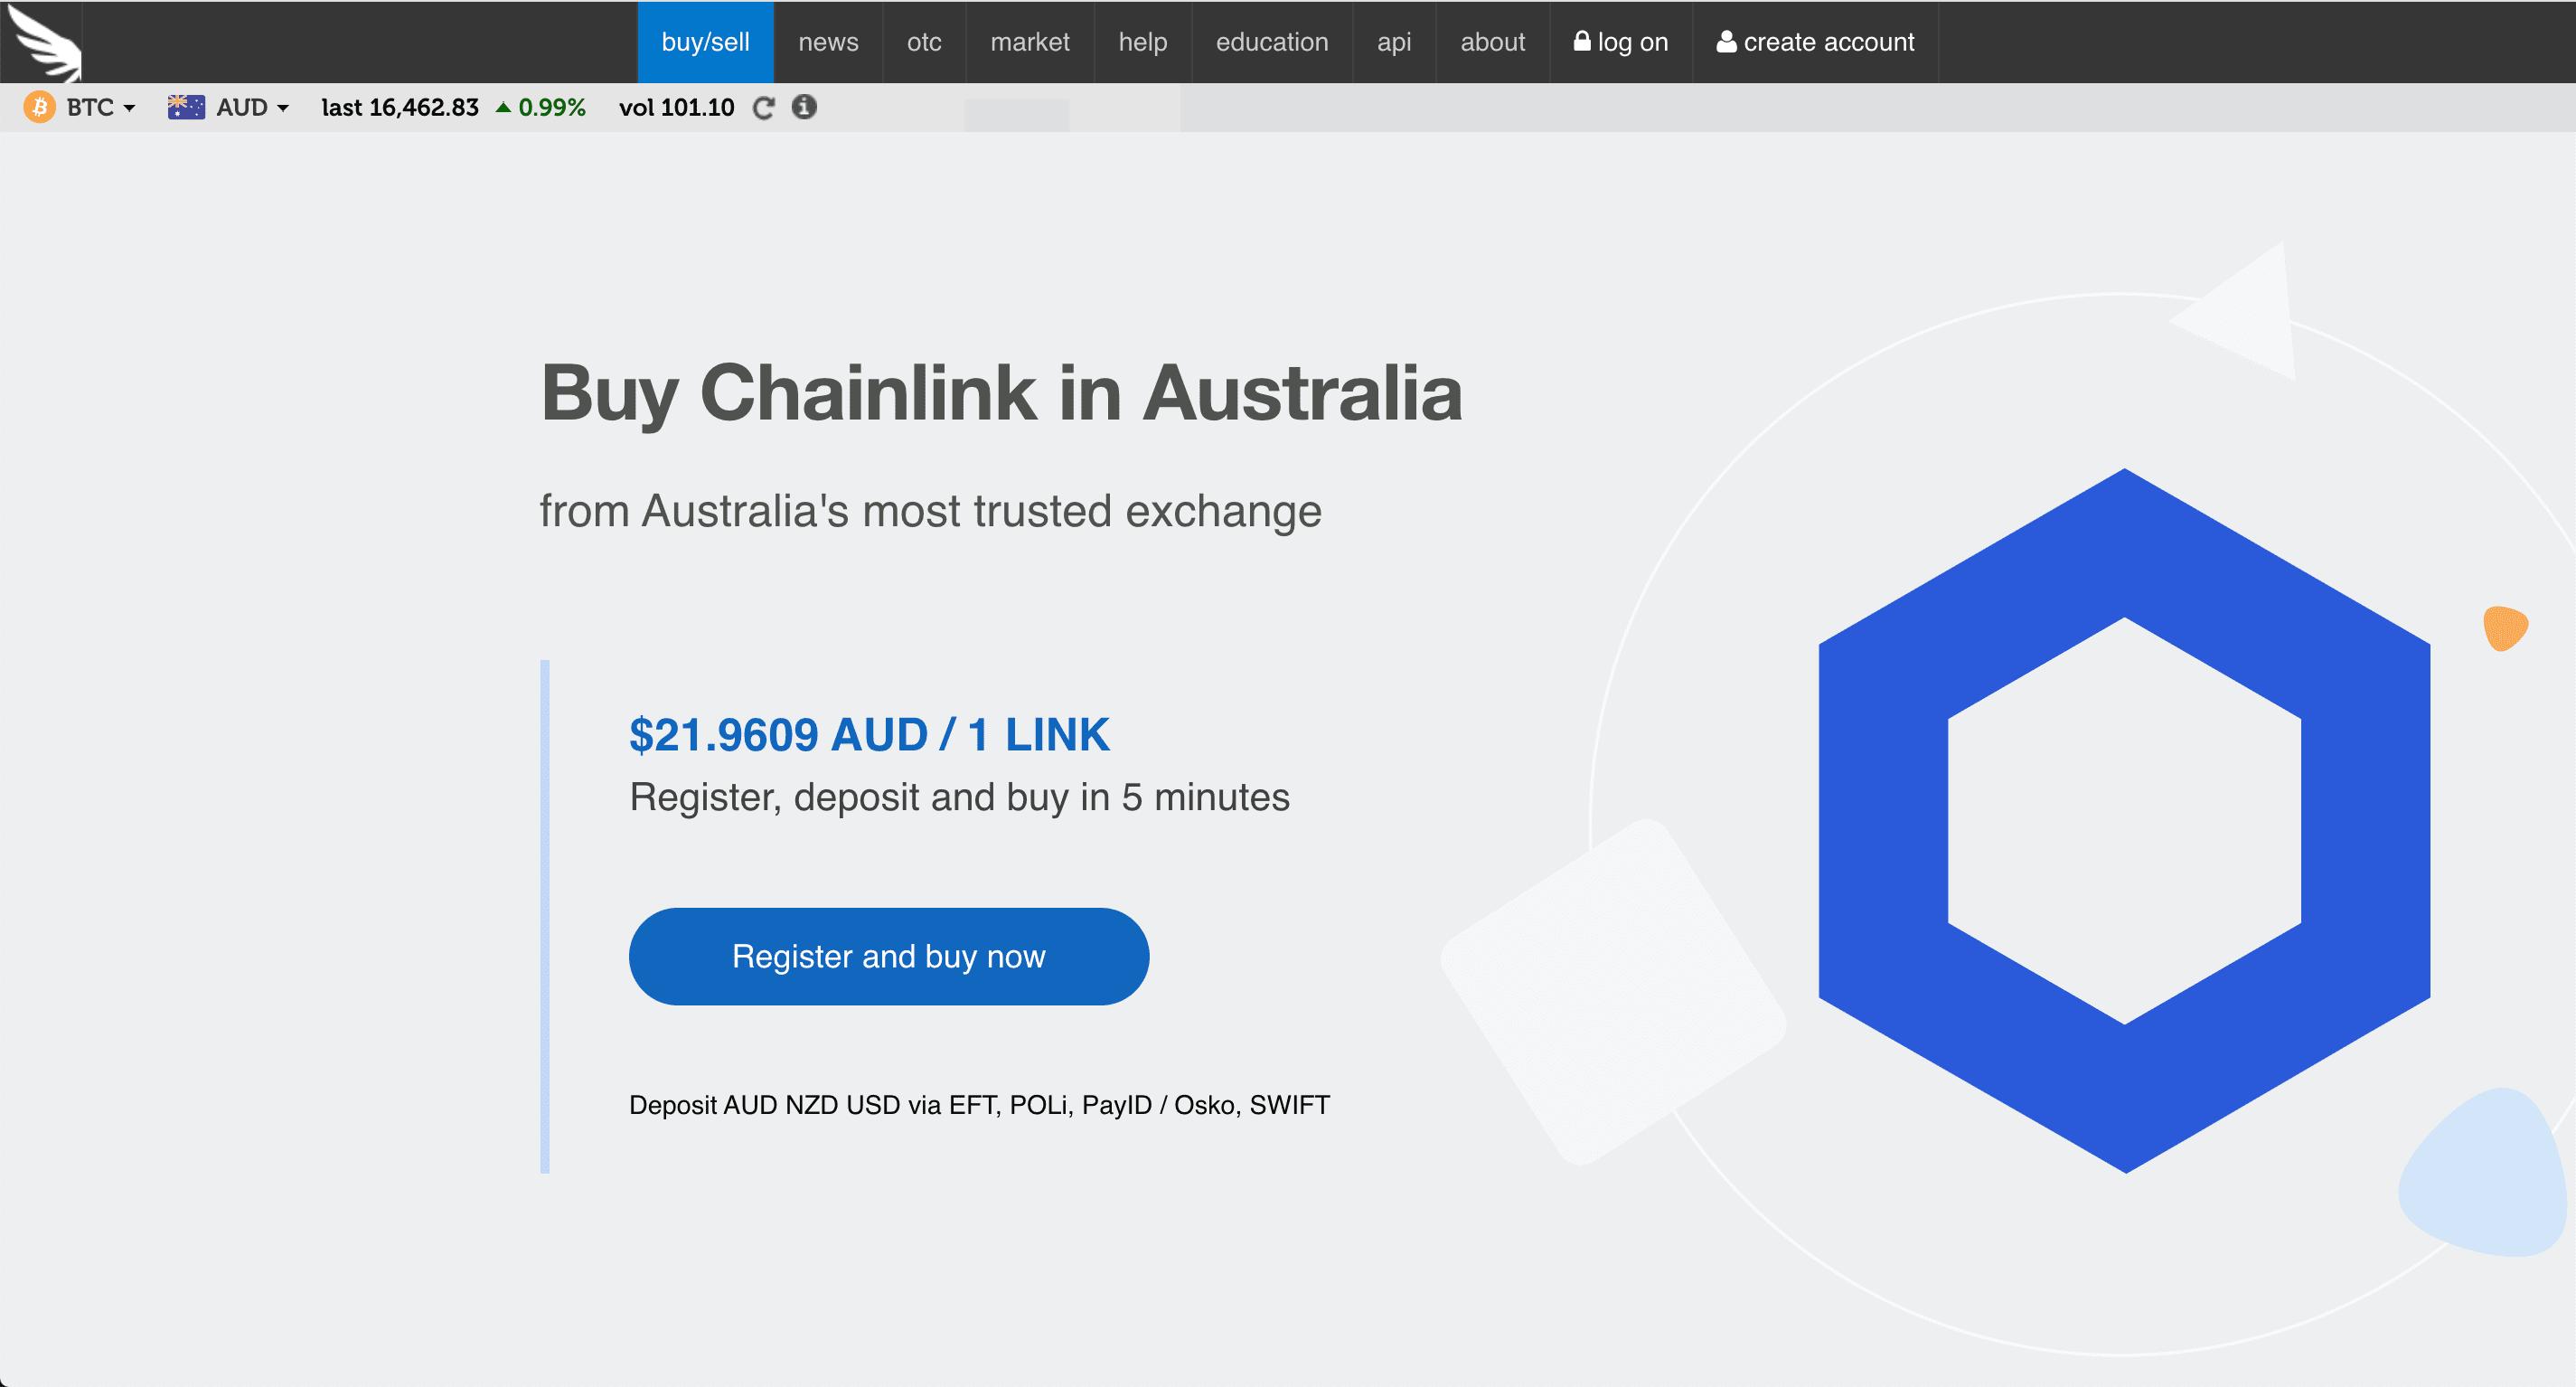 Buy Chainlink Australia - Independent Reserve